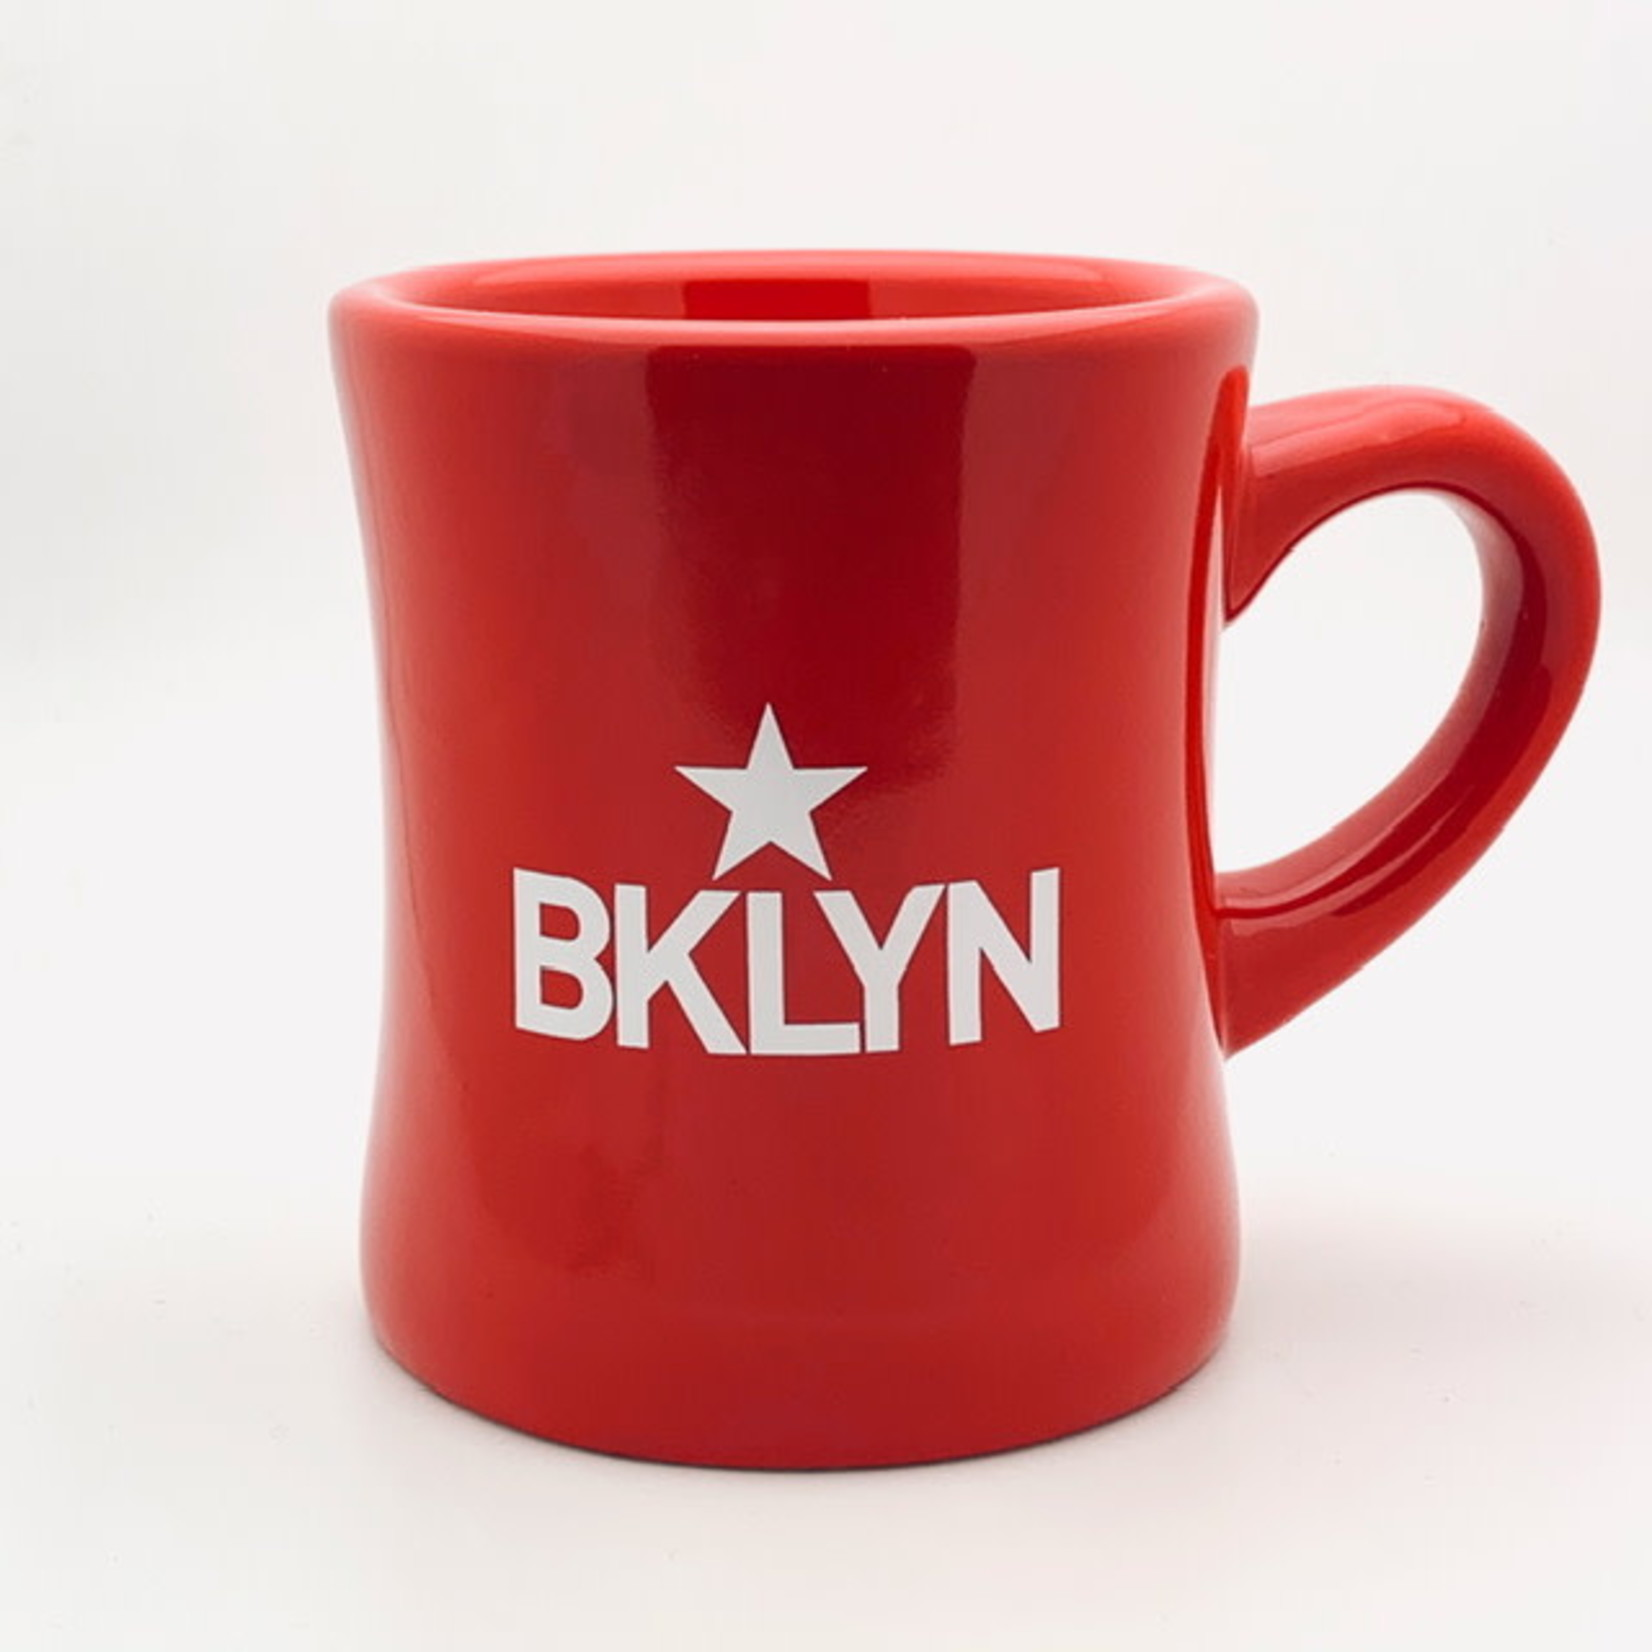 BKLYN Mug  - More Options Available